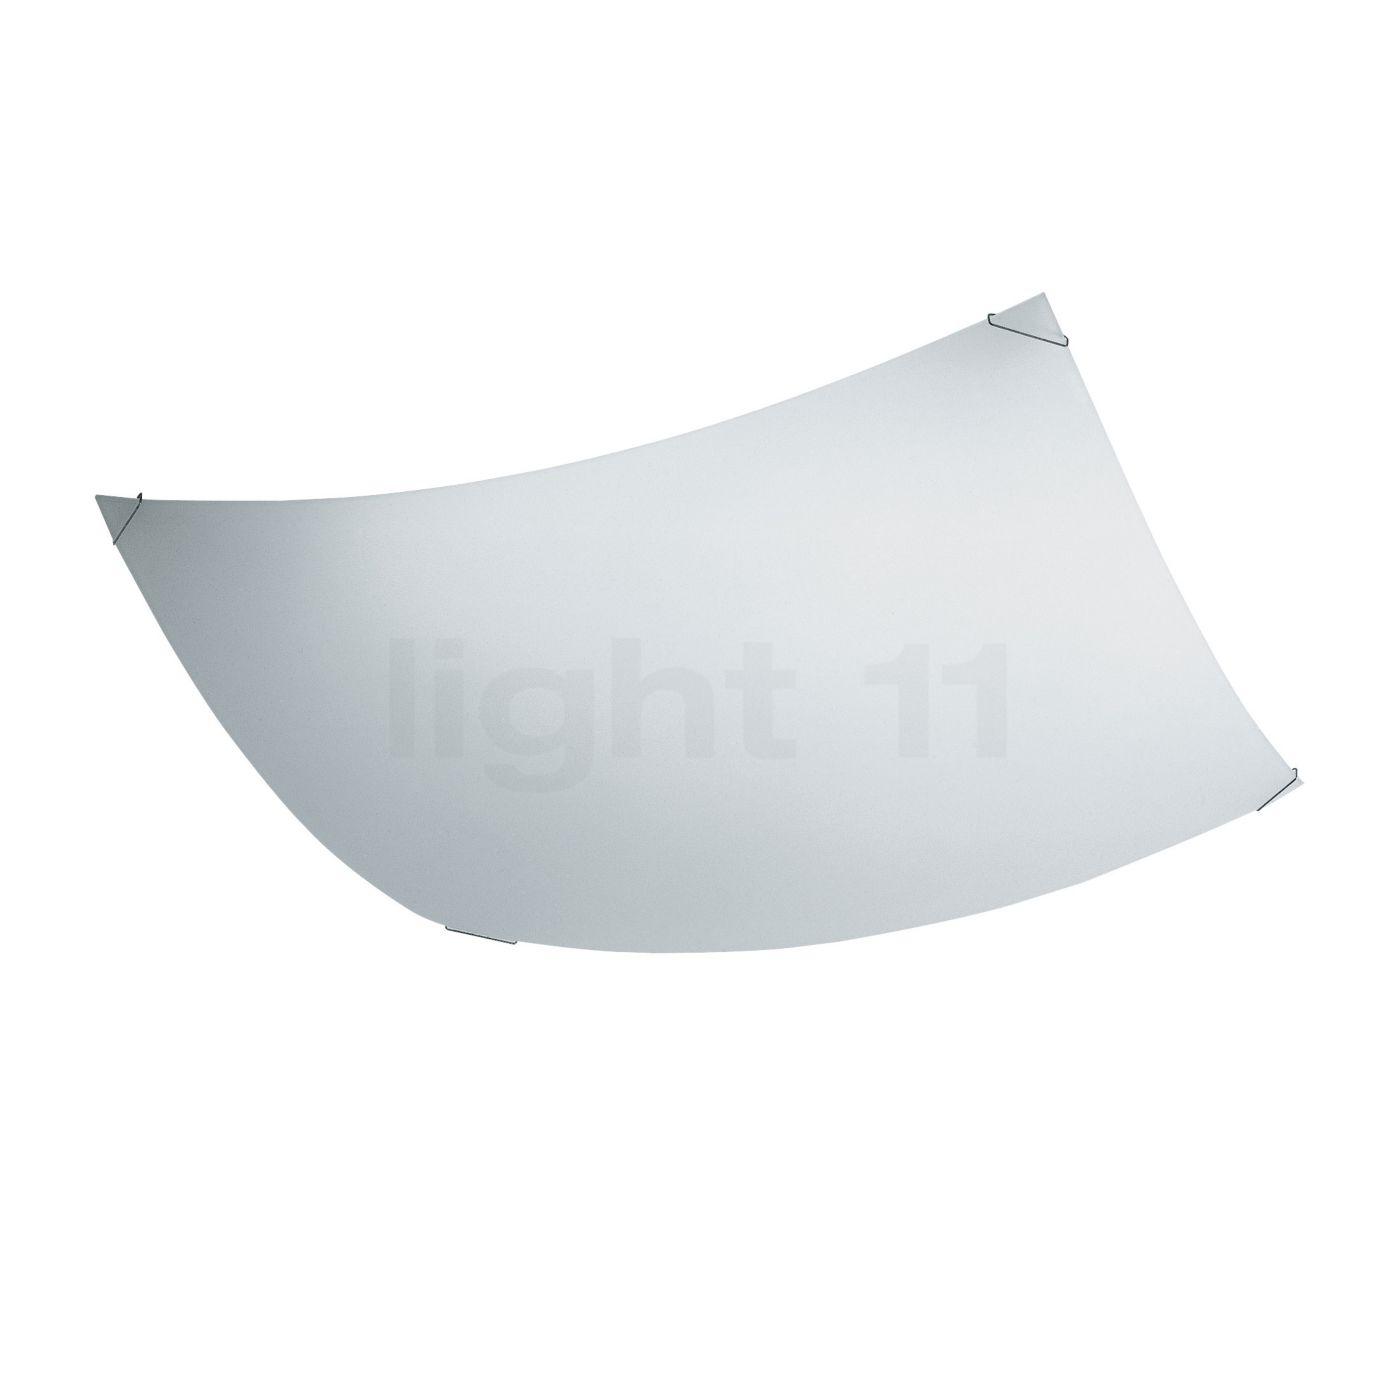 vibia quadra ice 1139 led plafondlamp kopen op. Black Bedroom Furniture Sets. Home Design Ideas